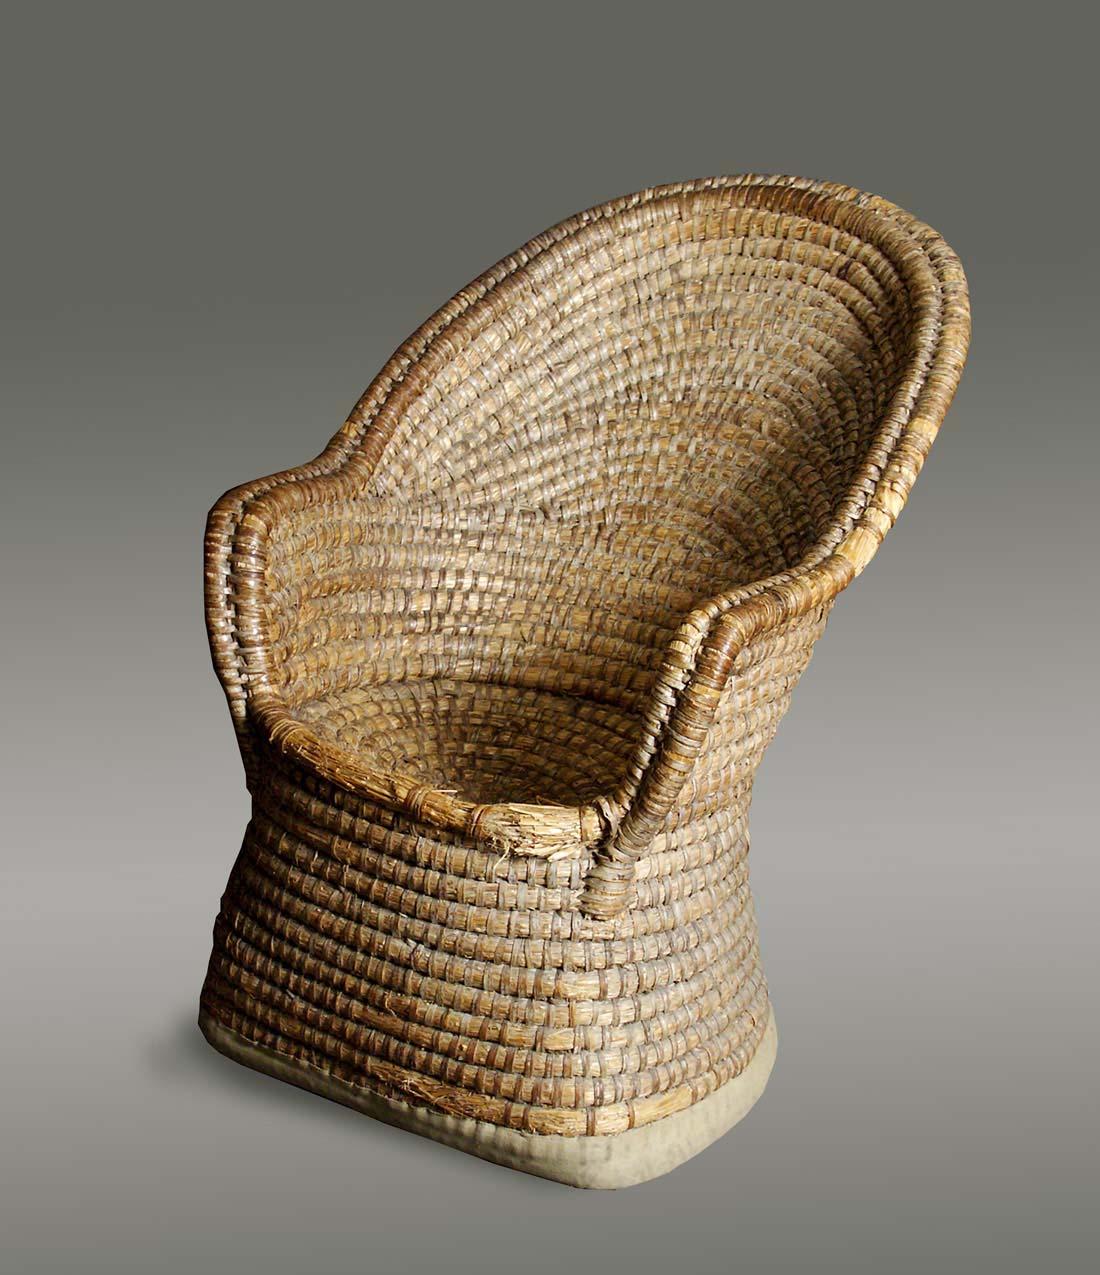 ANTIQUE LIPWORK CHAIR Welsh Lipwork Antique Welsh Chairs